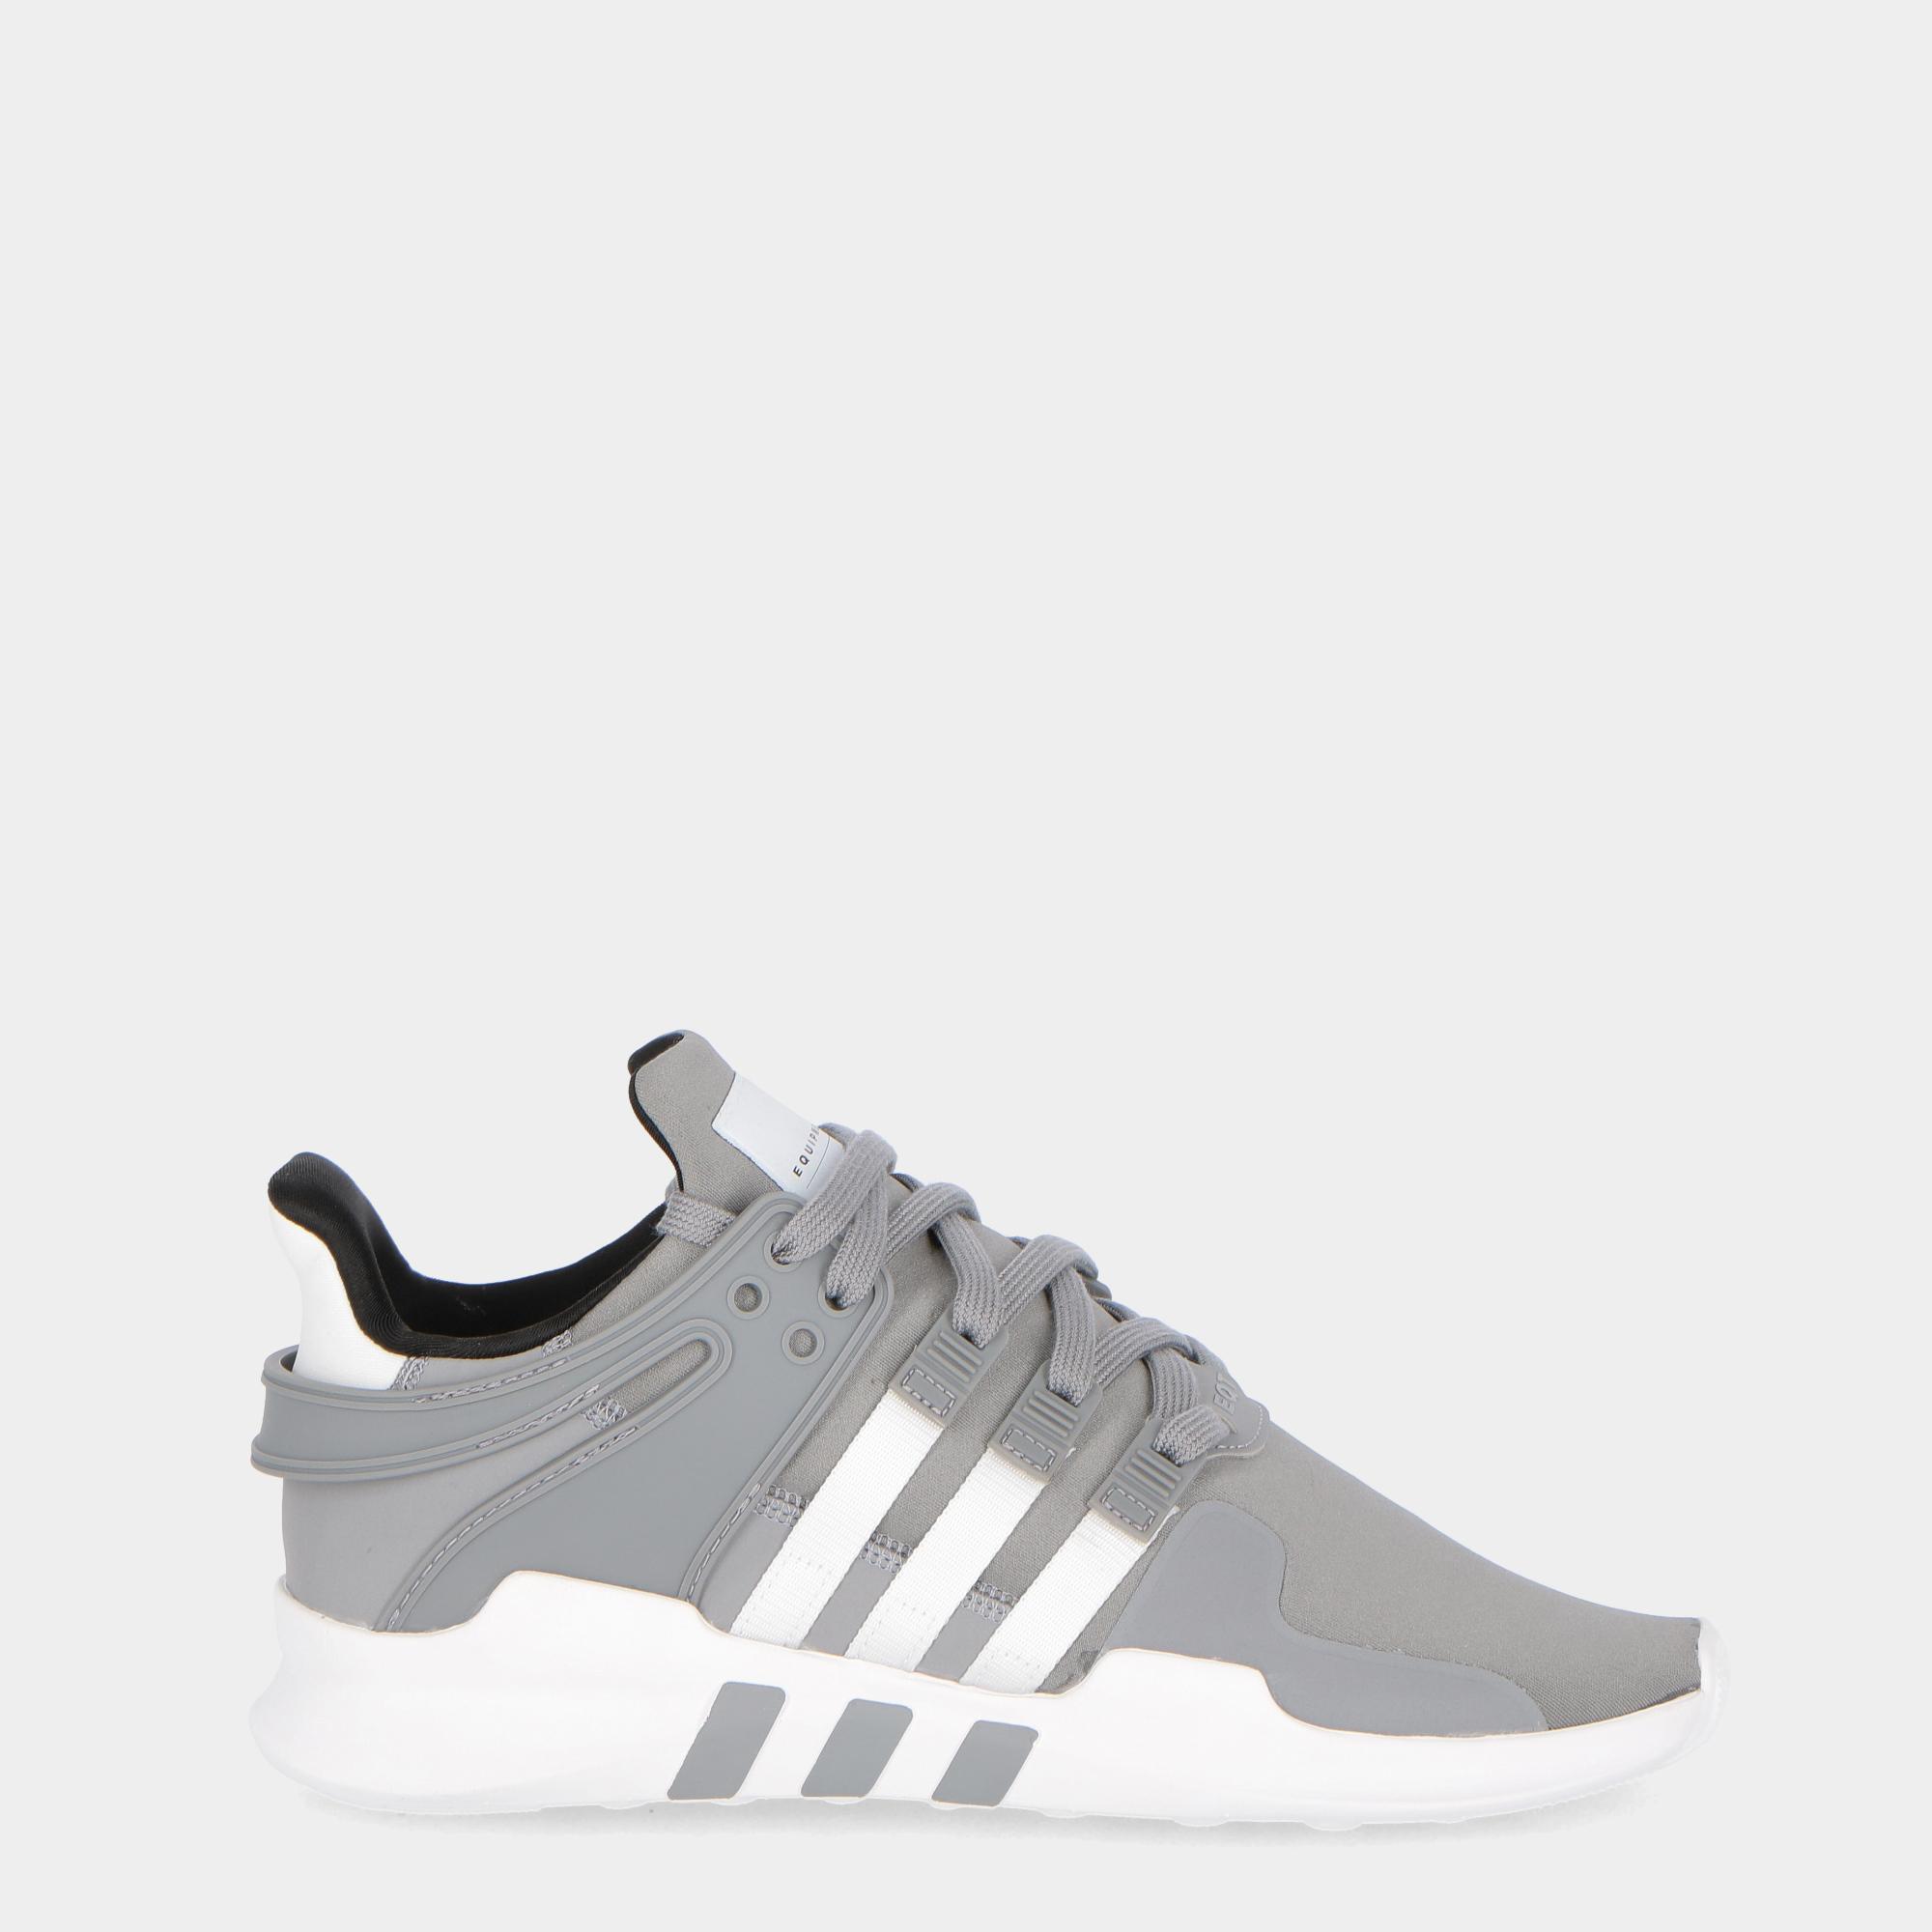 the best attitude 8b73c 7f5a1 Adidas Eqt Support Adv Grey White Black   Treesse